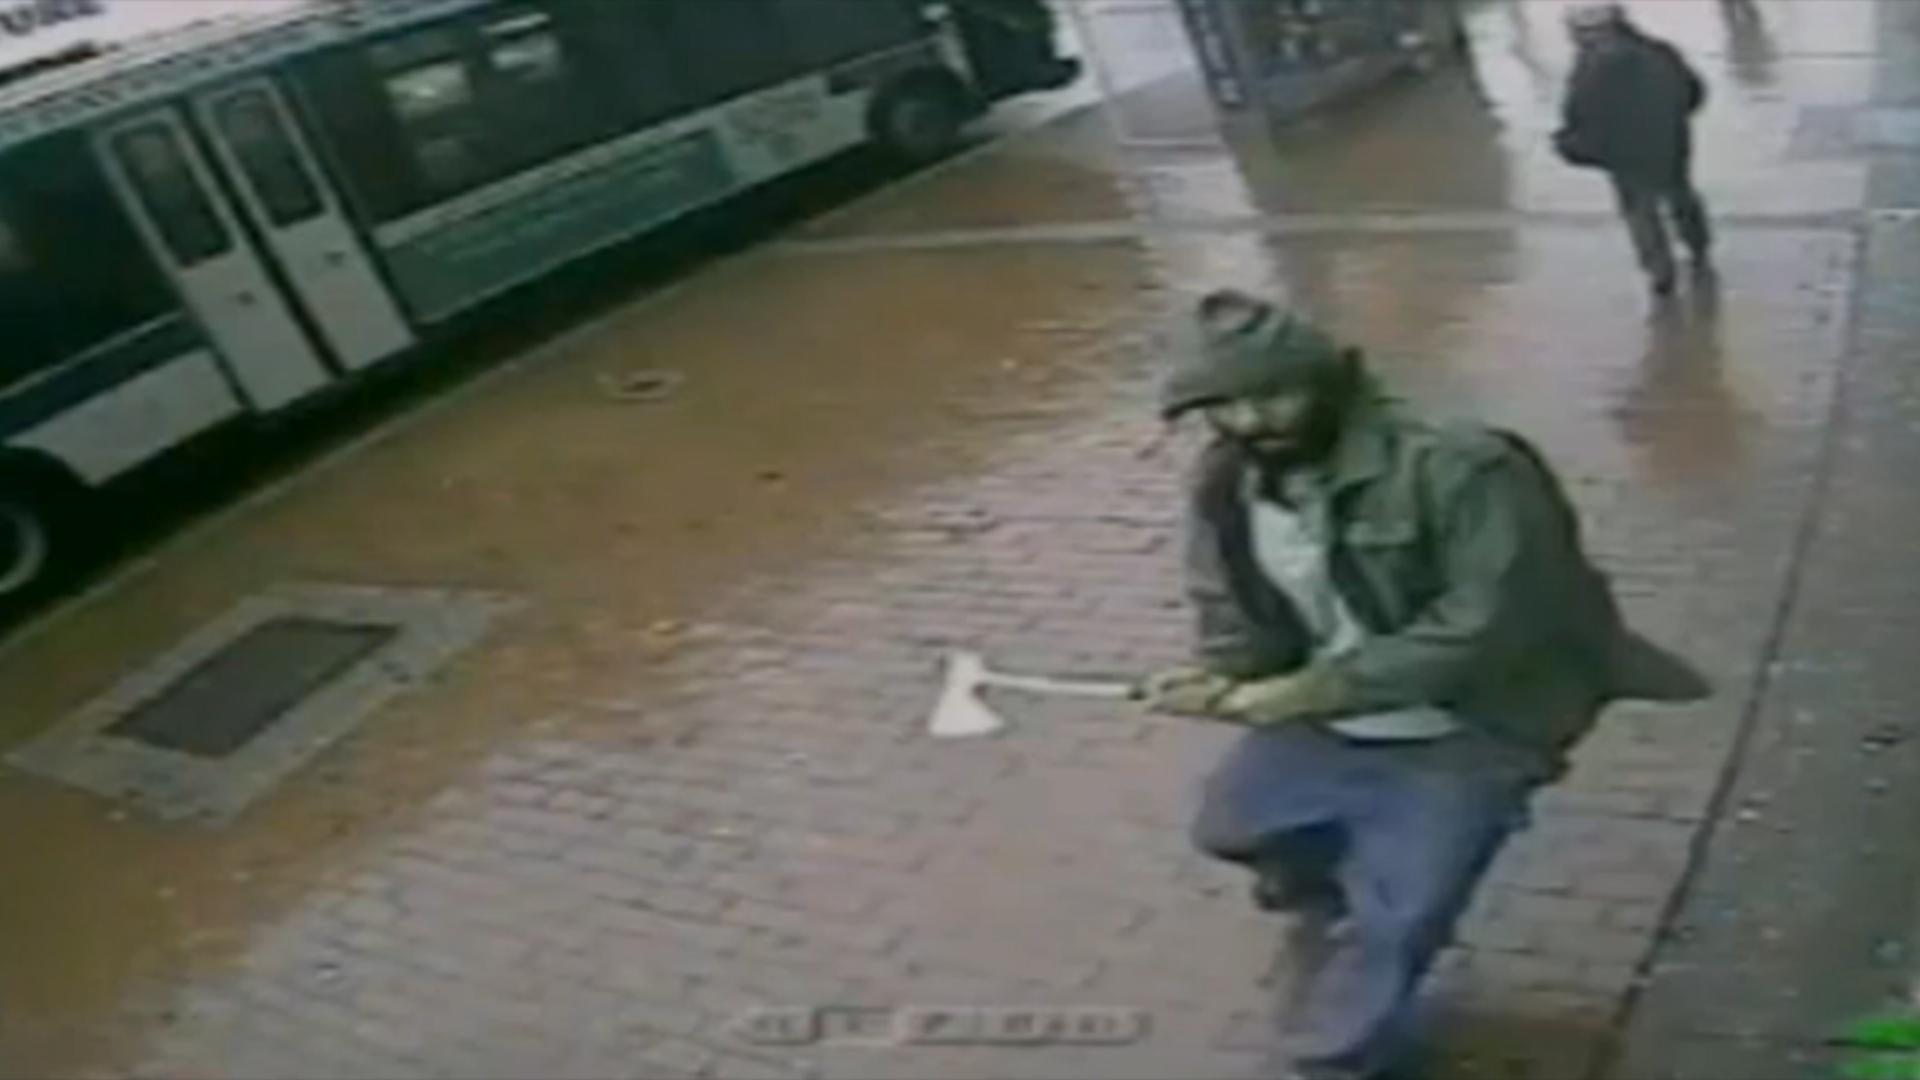 Video of man wielding hatchet before attack